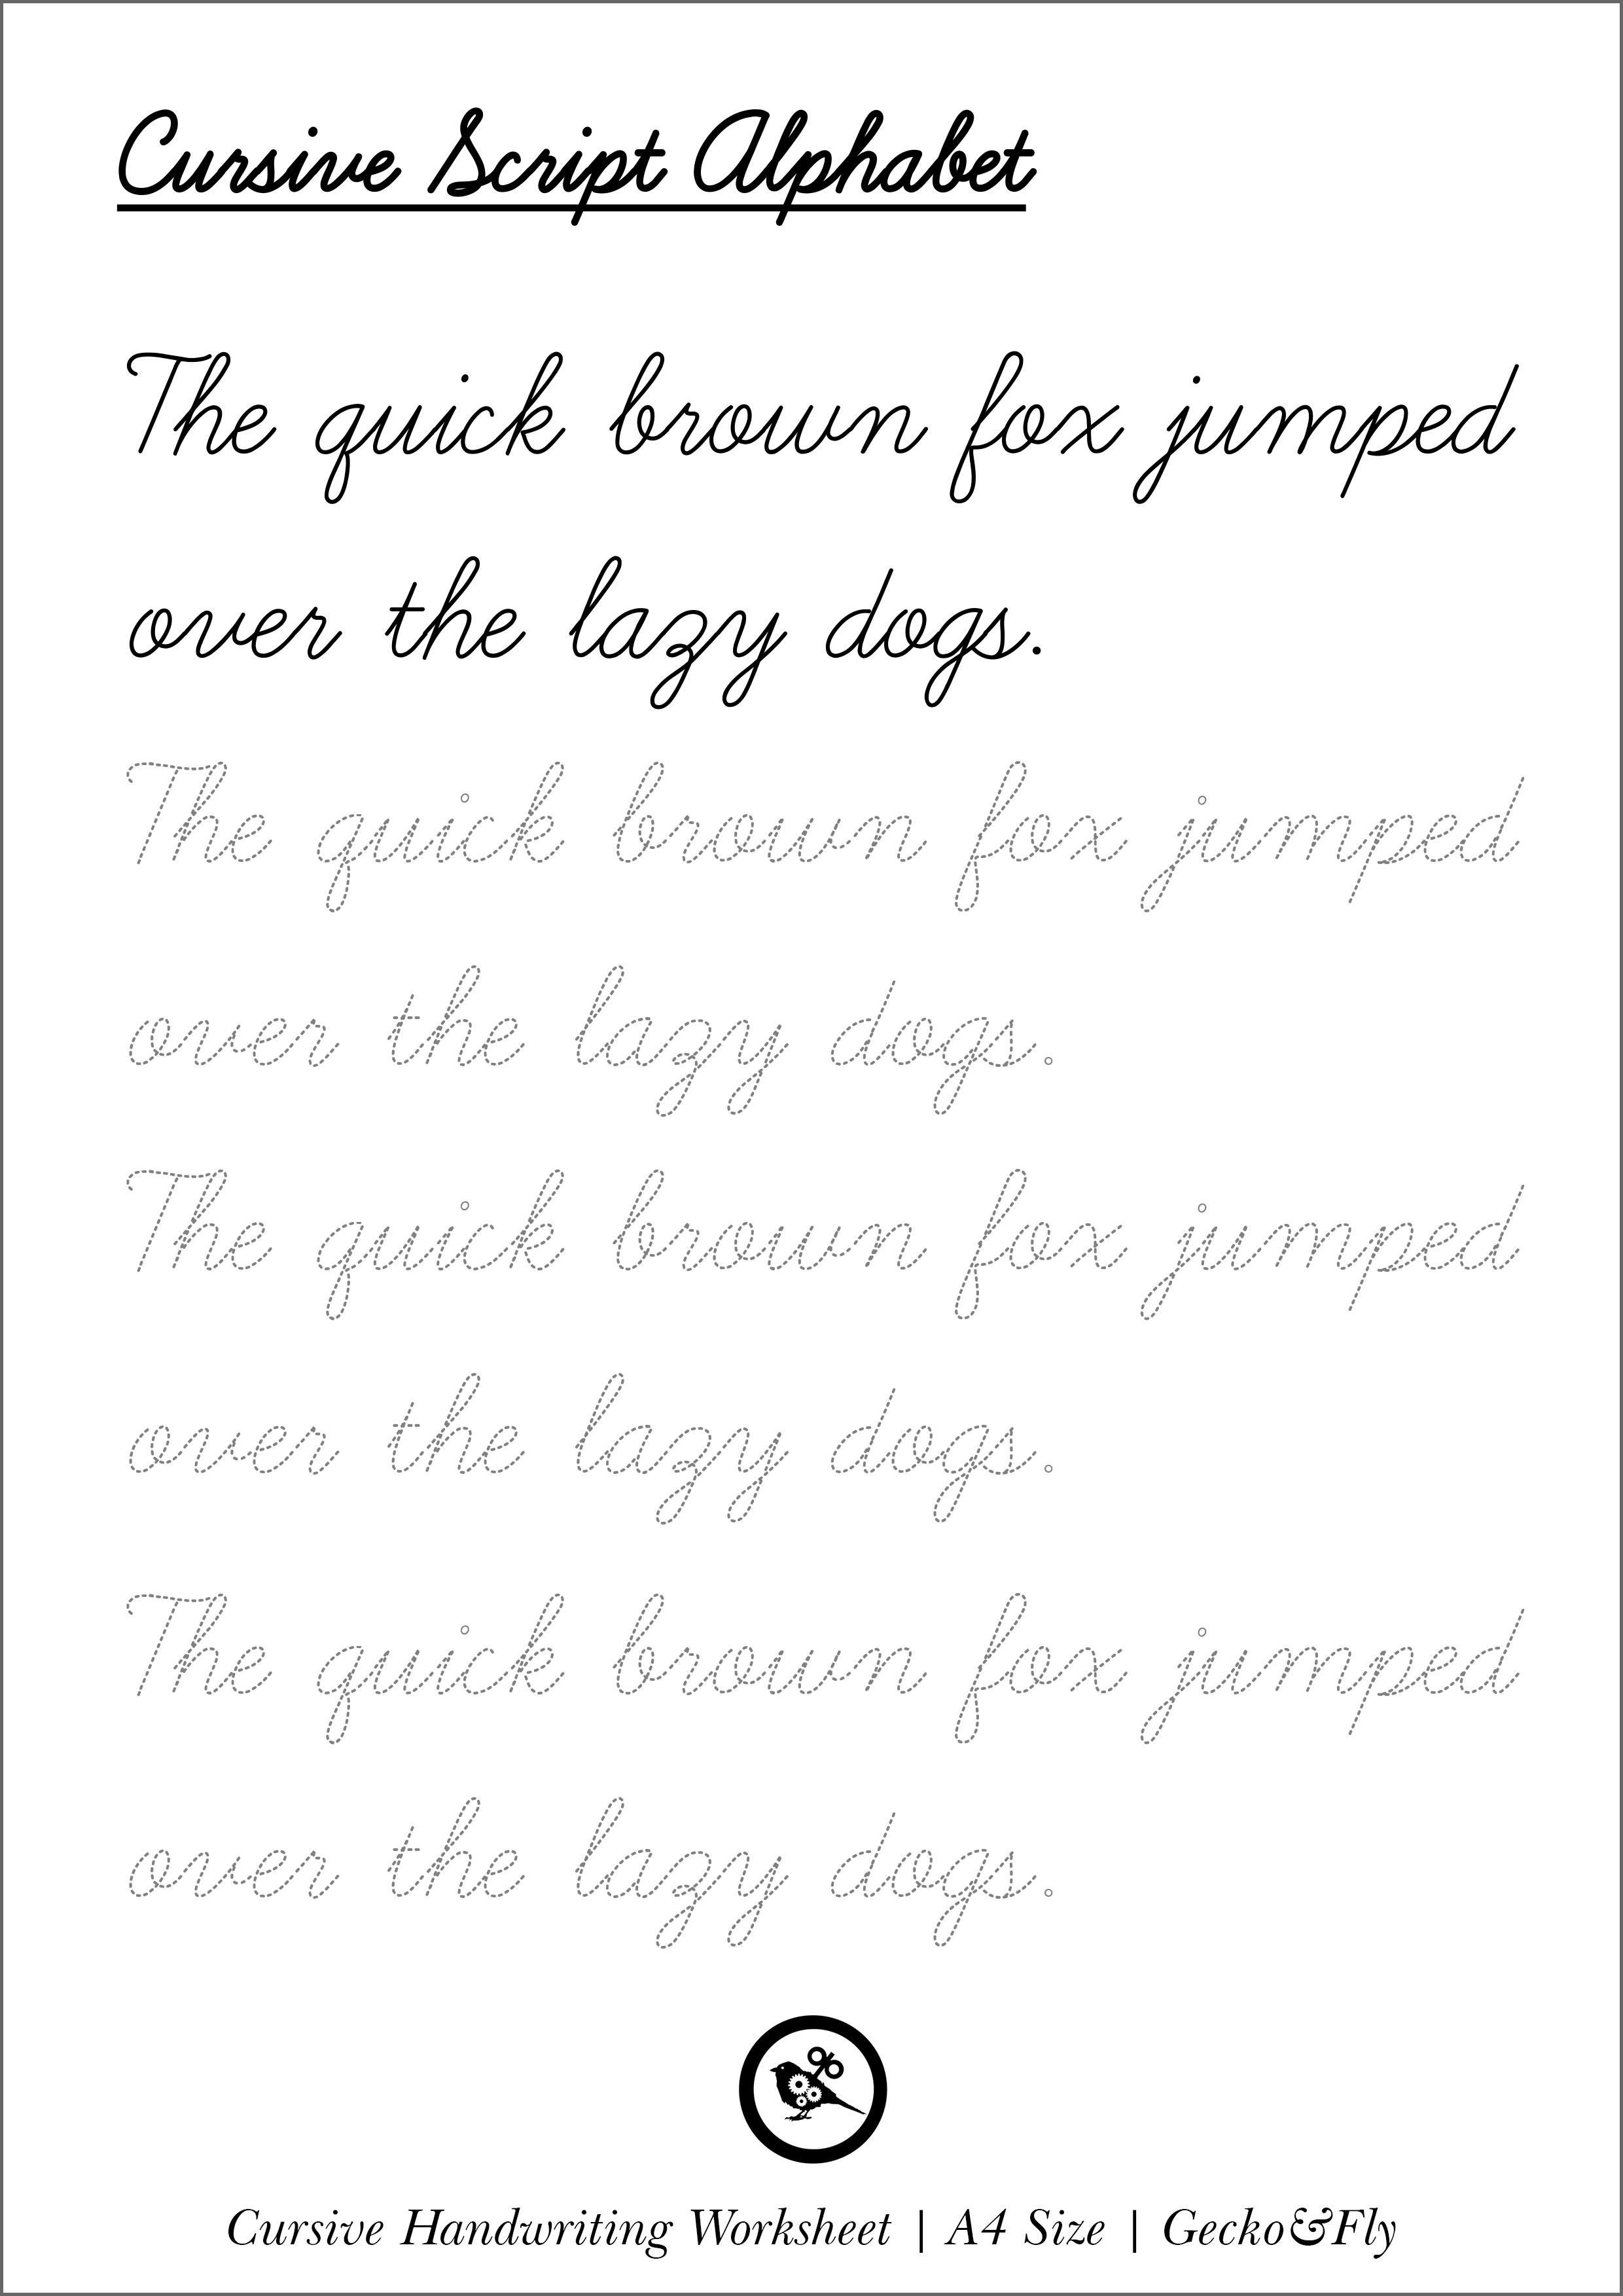 5 Printable Cursive Handwriting Worksheets For Beautiful Penmanship - Free Printable Cursive Writing Paragraphs